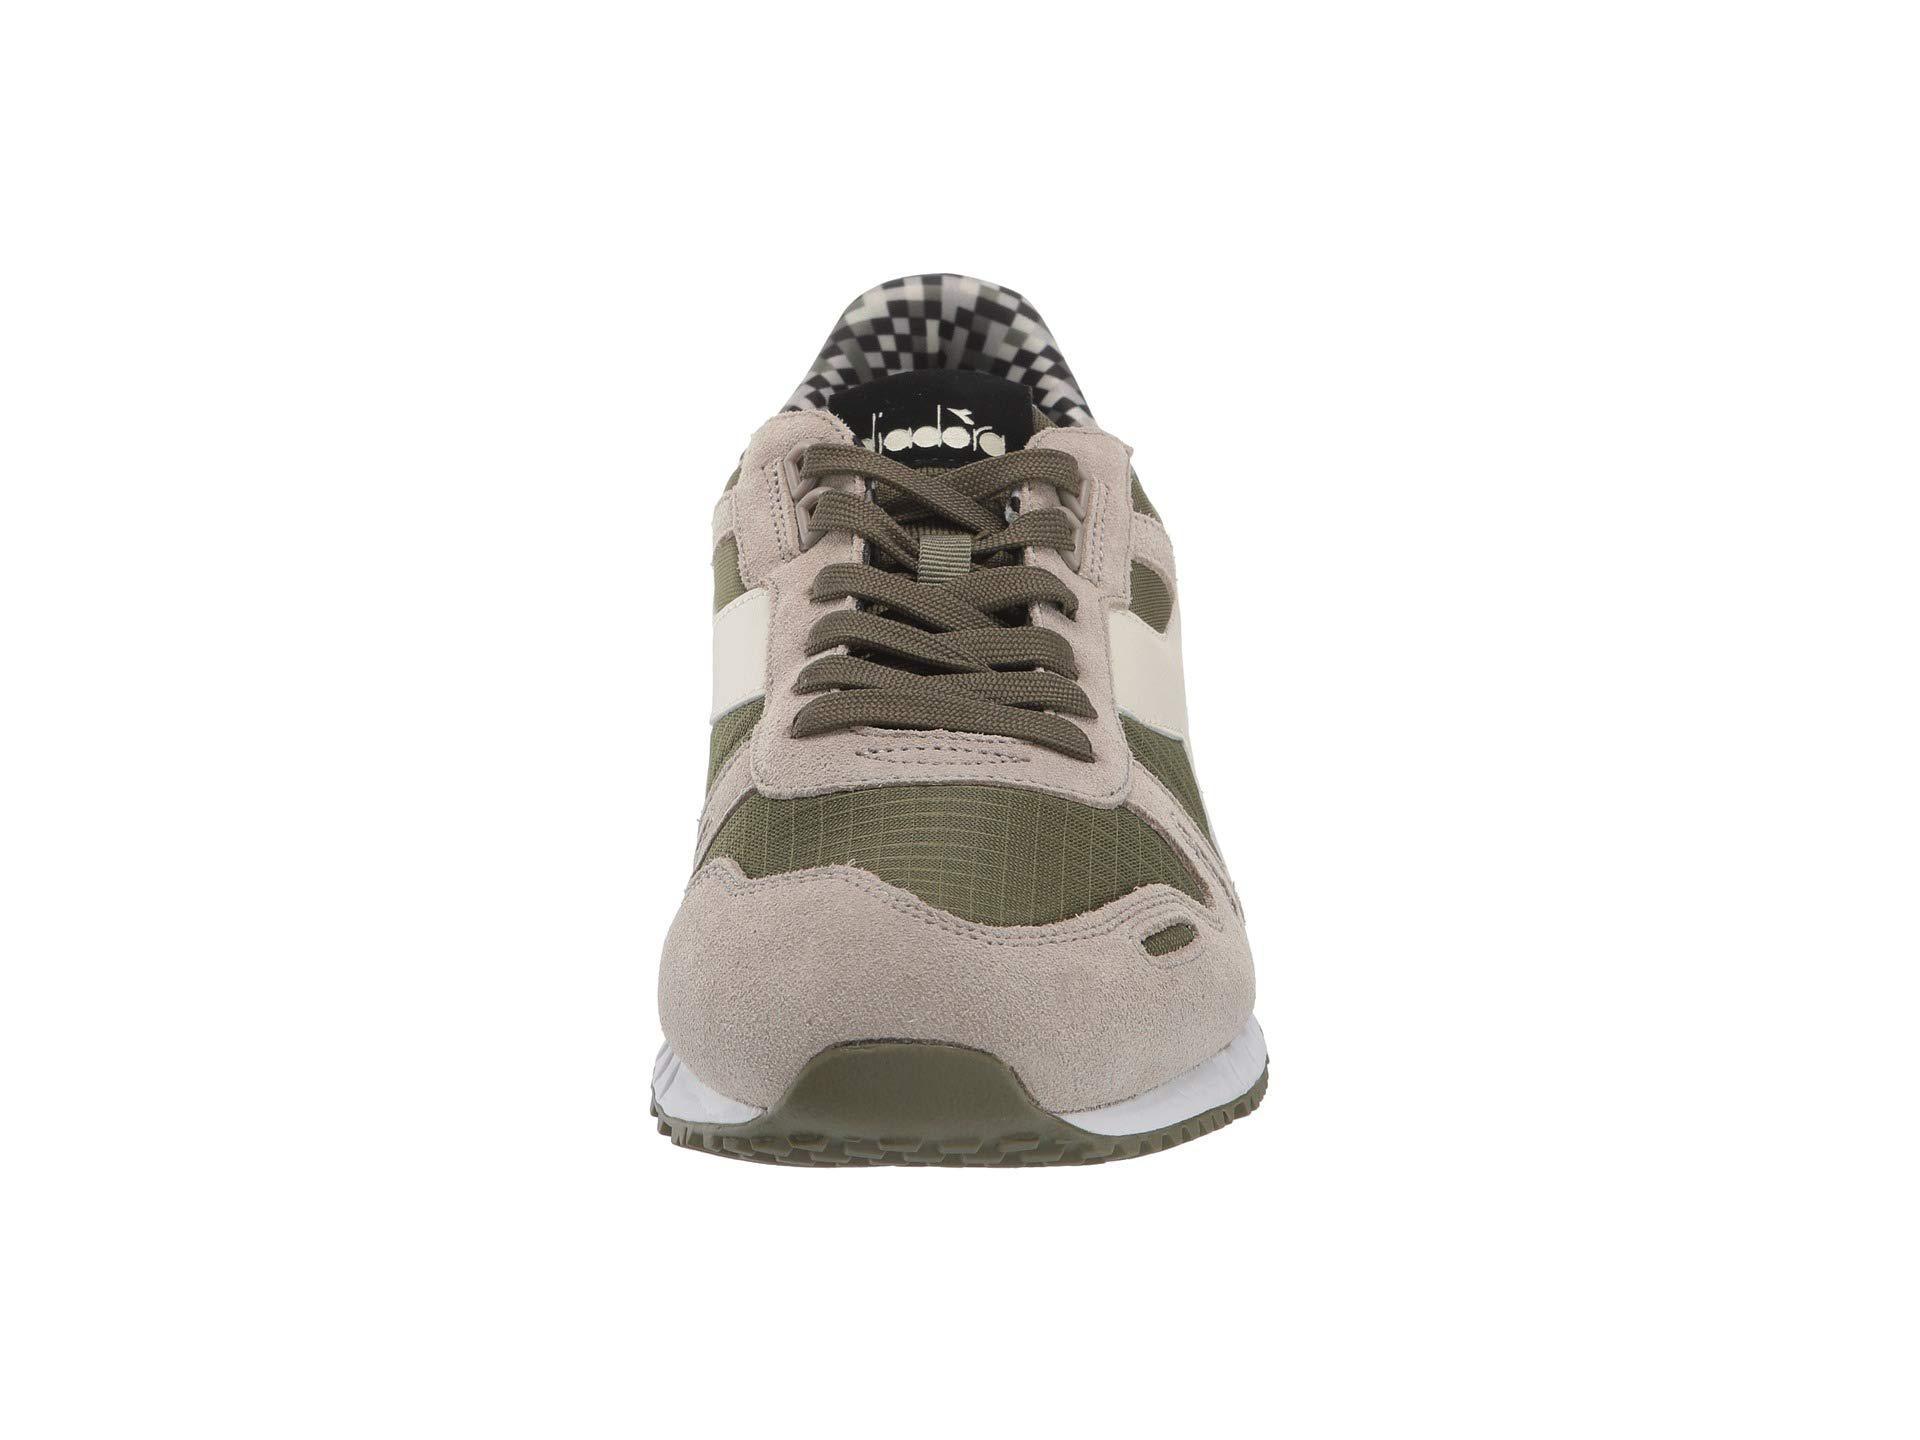 Olive Camo Green Diadora Titan burnt Artic Men Men's Lyst For Shoes x1XYwUY